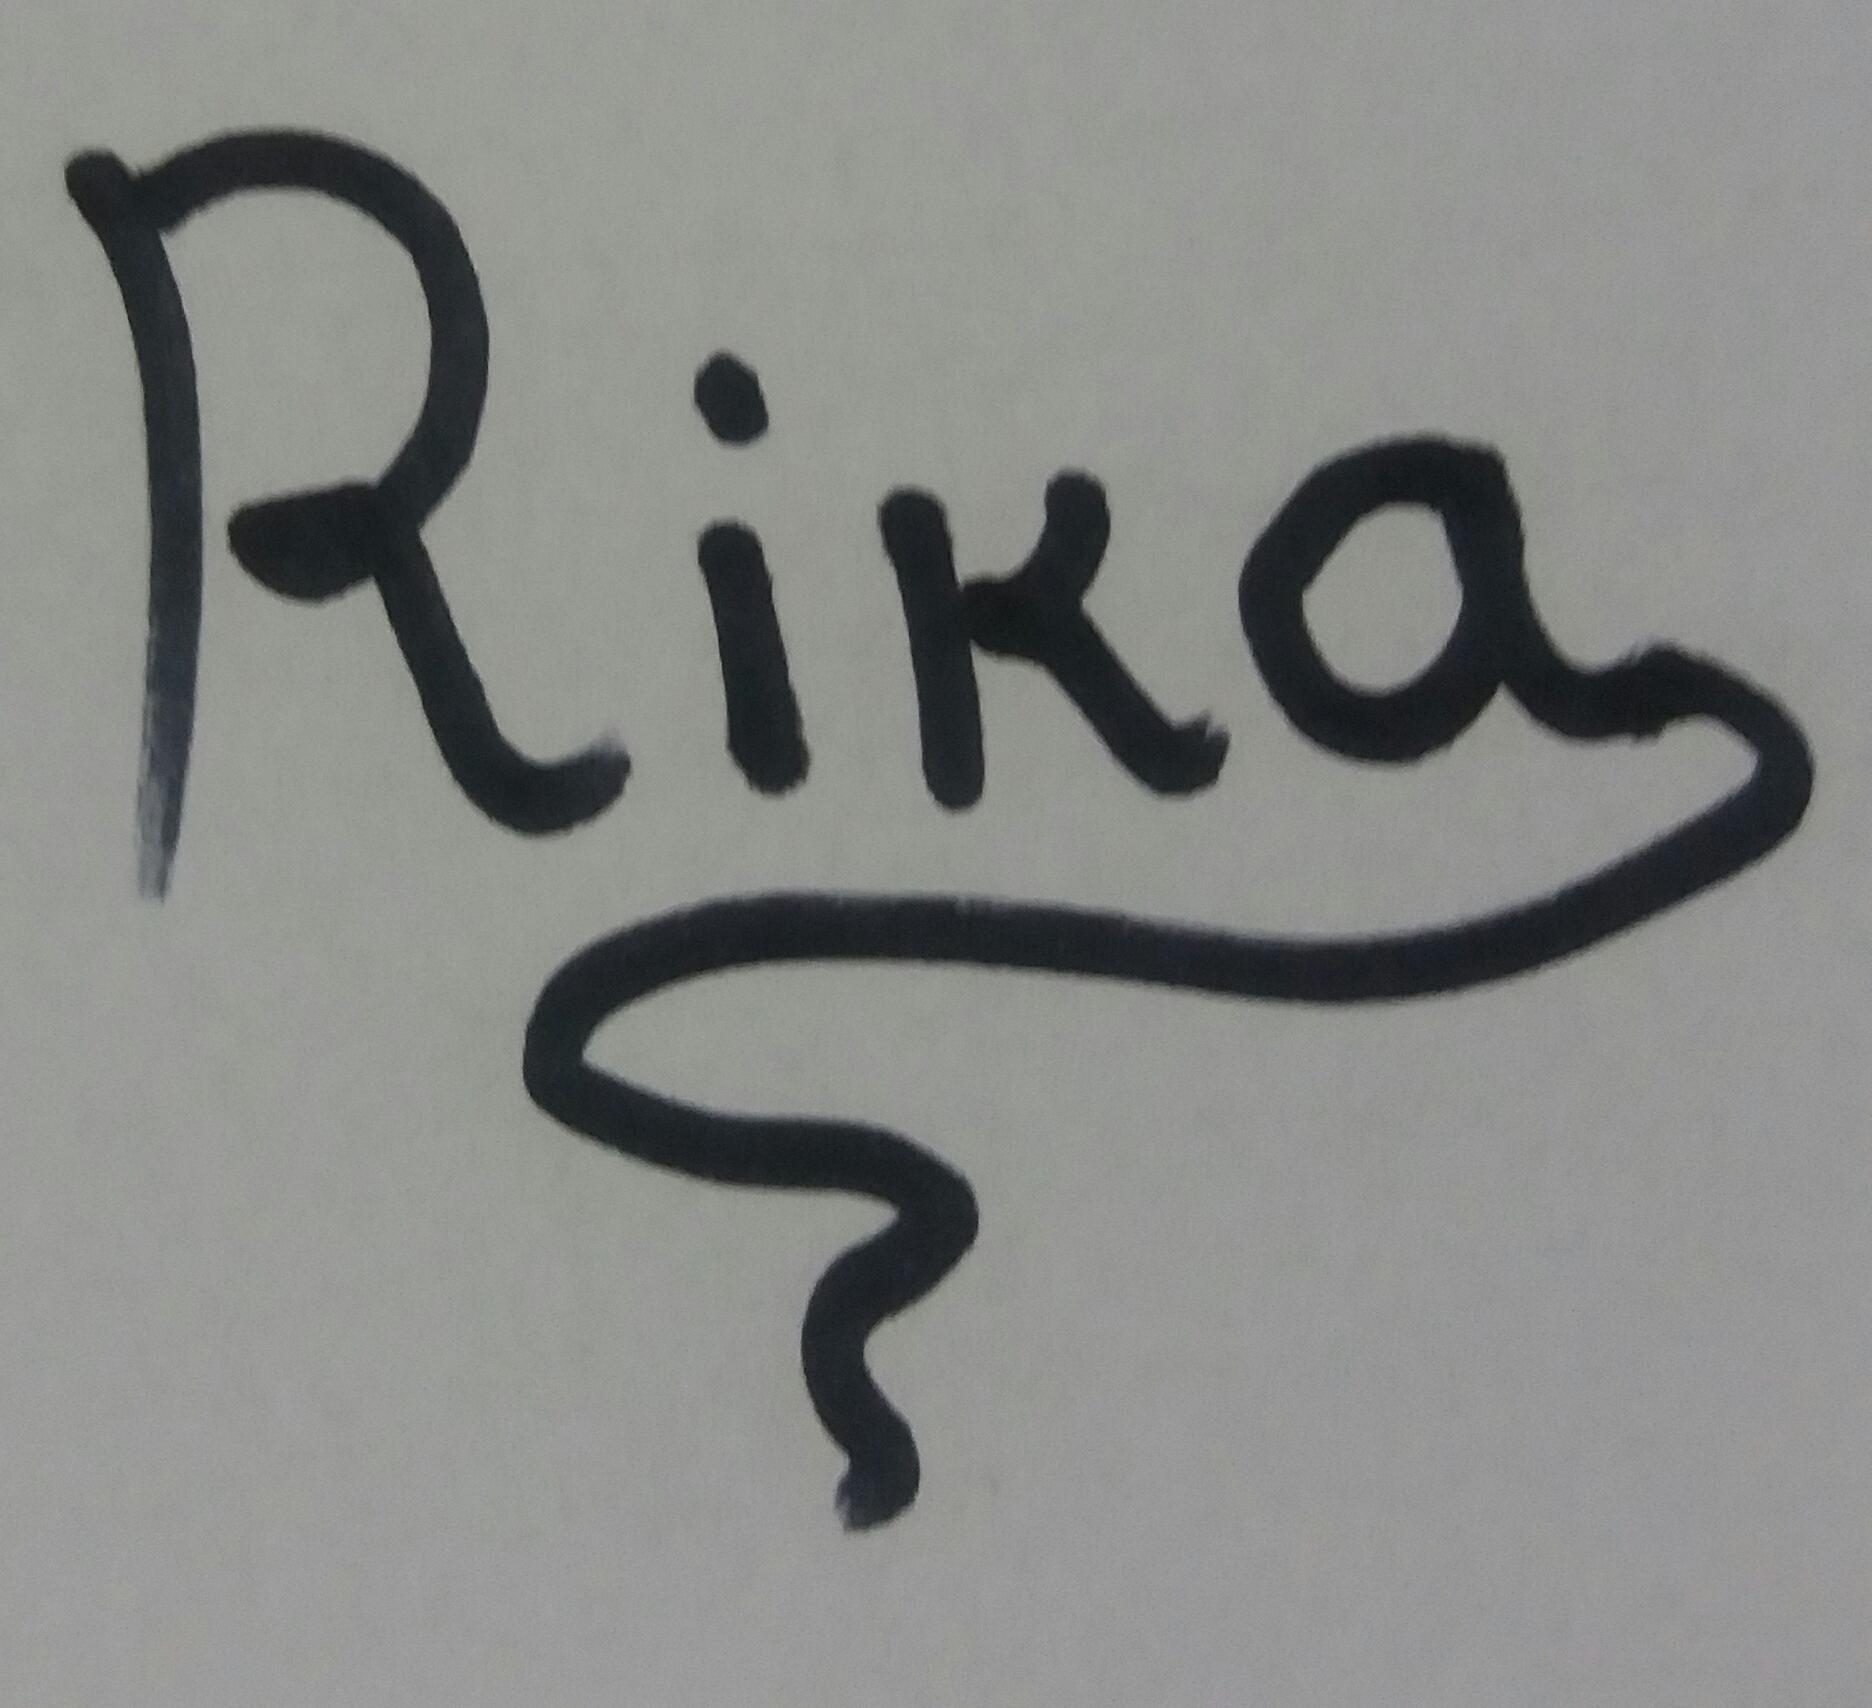 Rivka sheffer's Signature